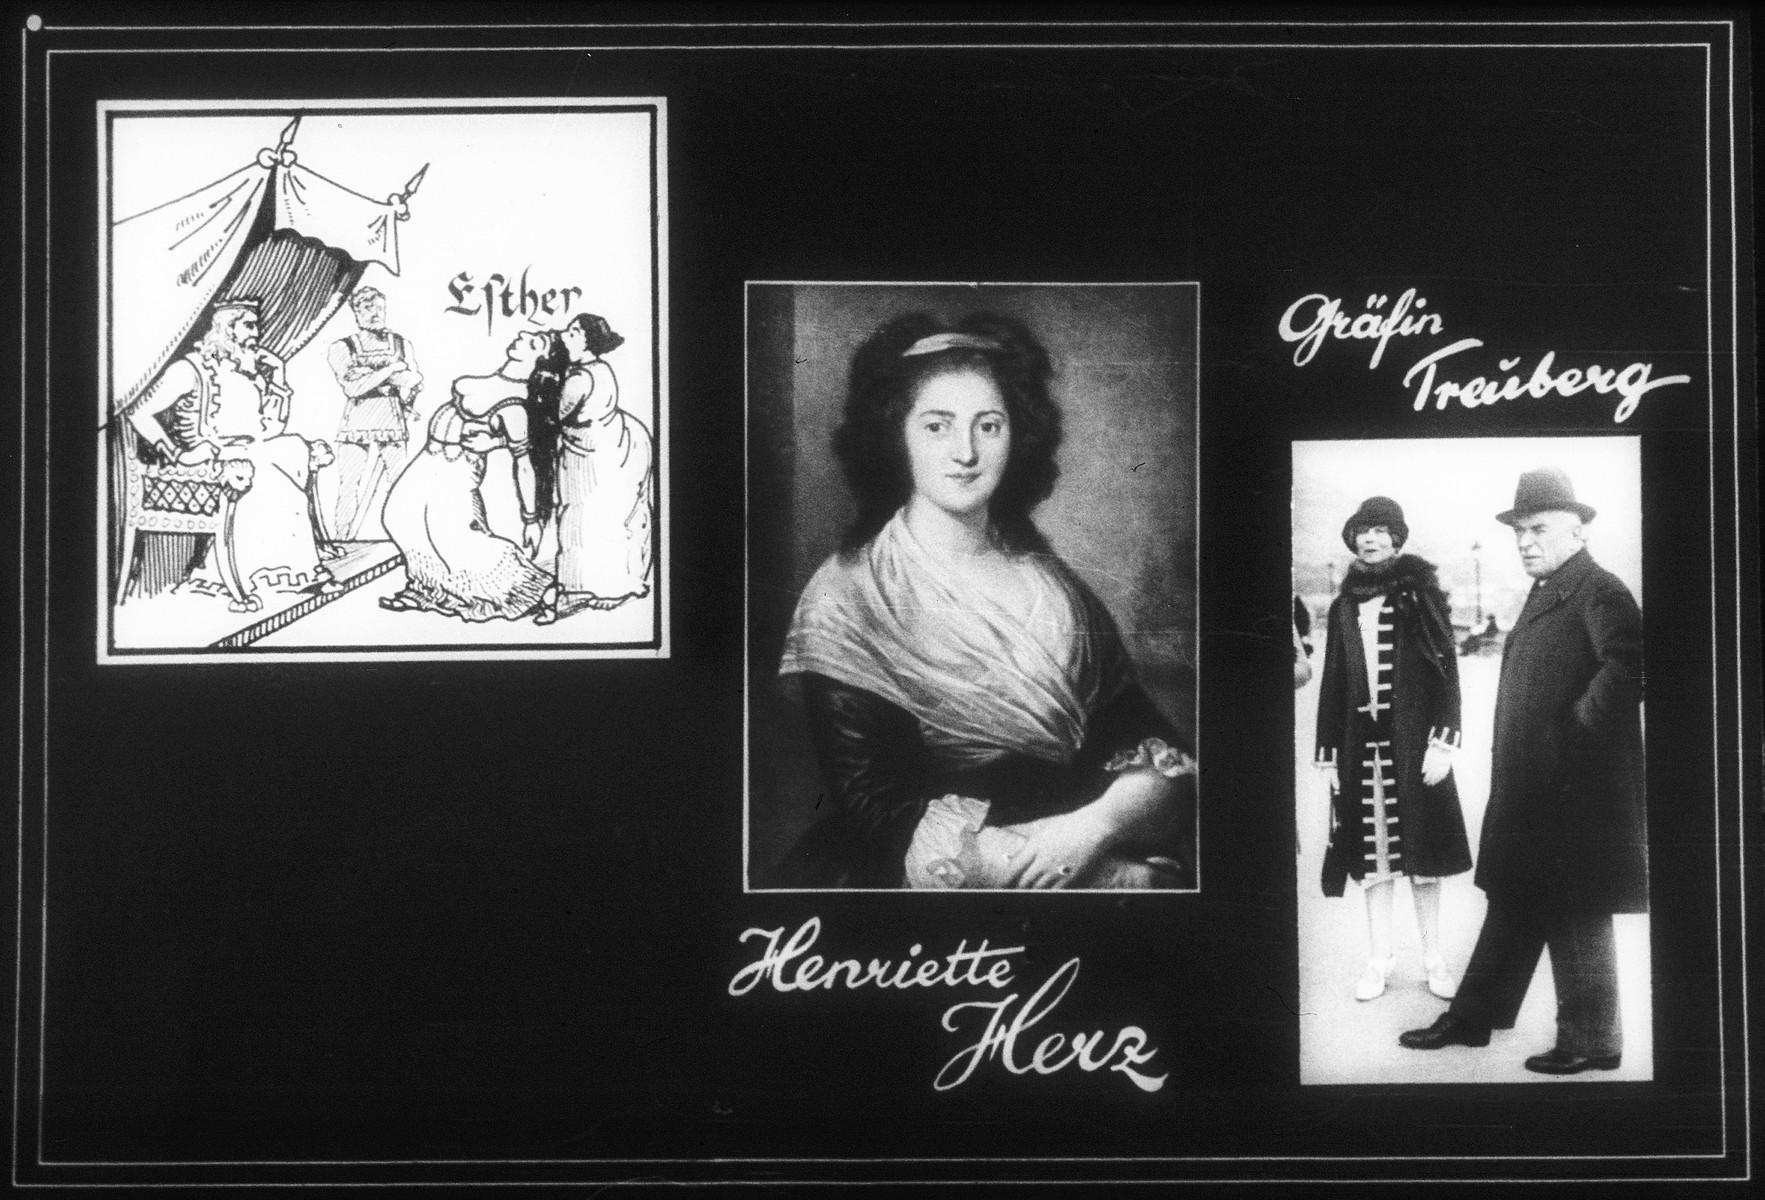 Propaganda slide featuring a portrait of Henrietta Herz, Gräfin Traiberg, and a scene from the Scroll of Esther.